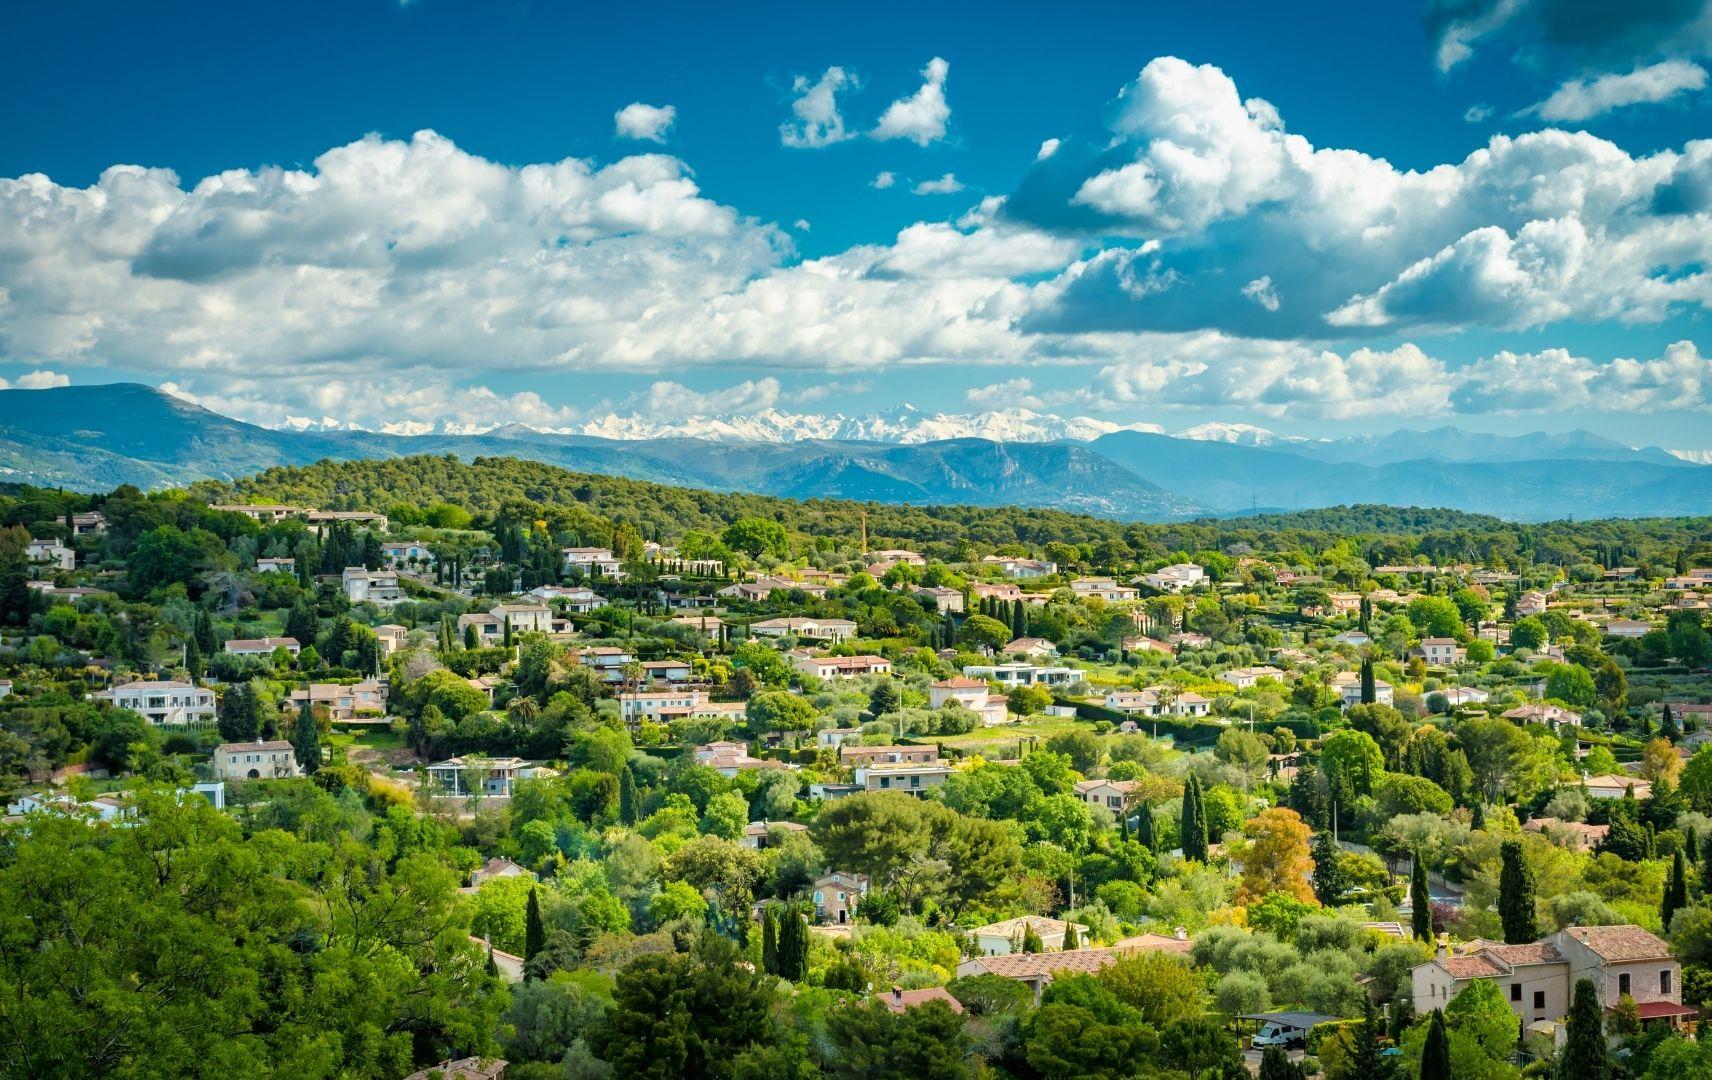 Frankreich - Mougins Landschaft